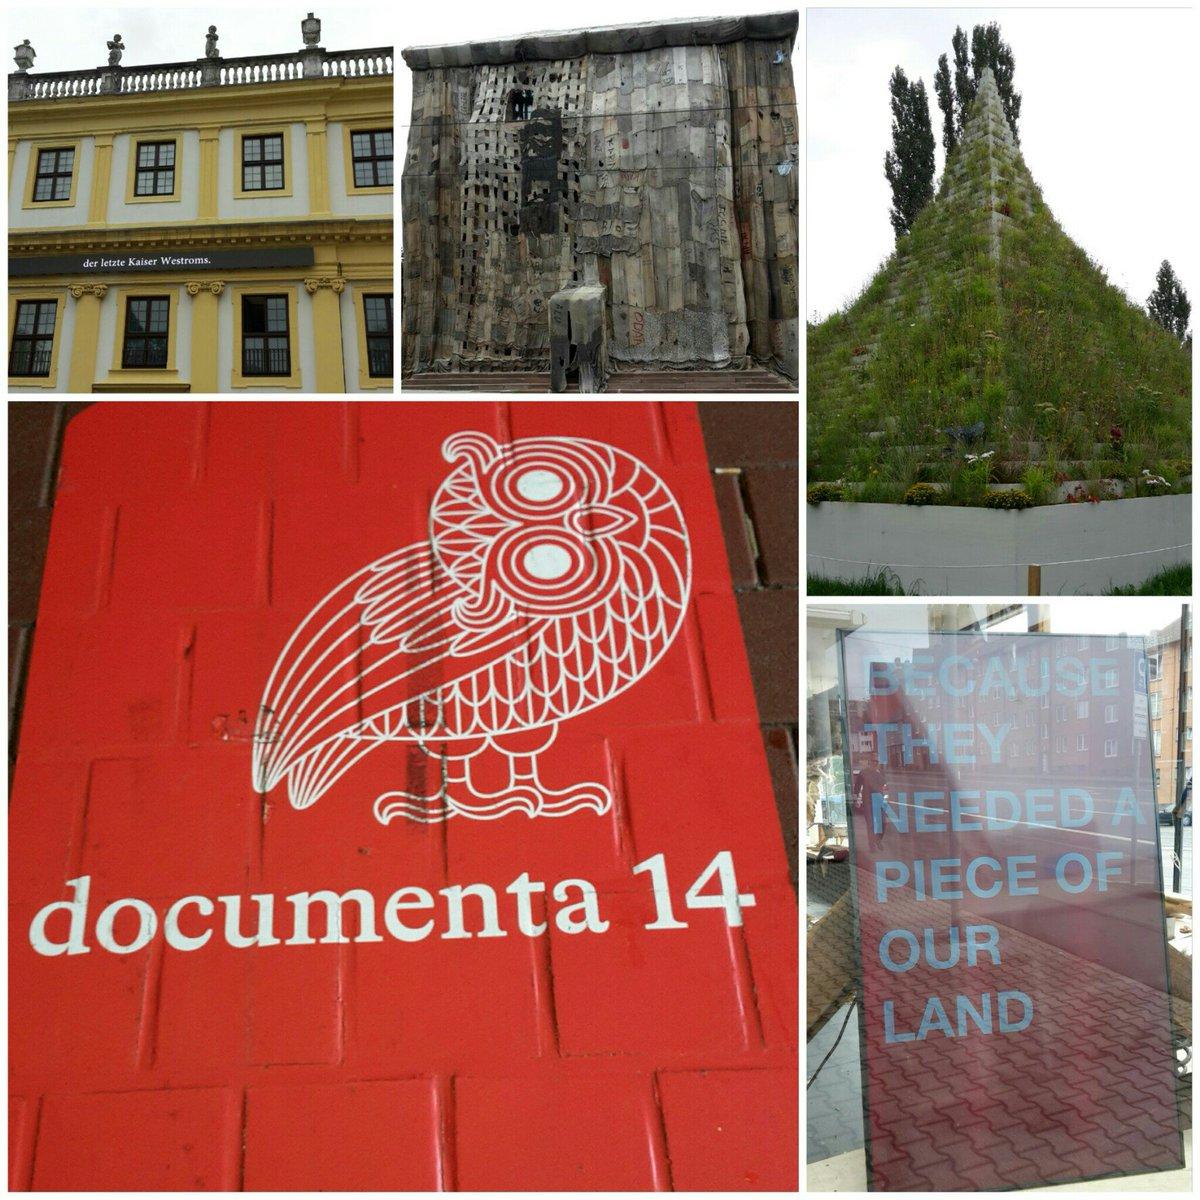 #documenta